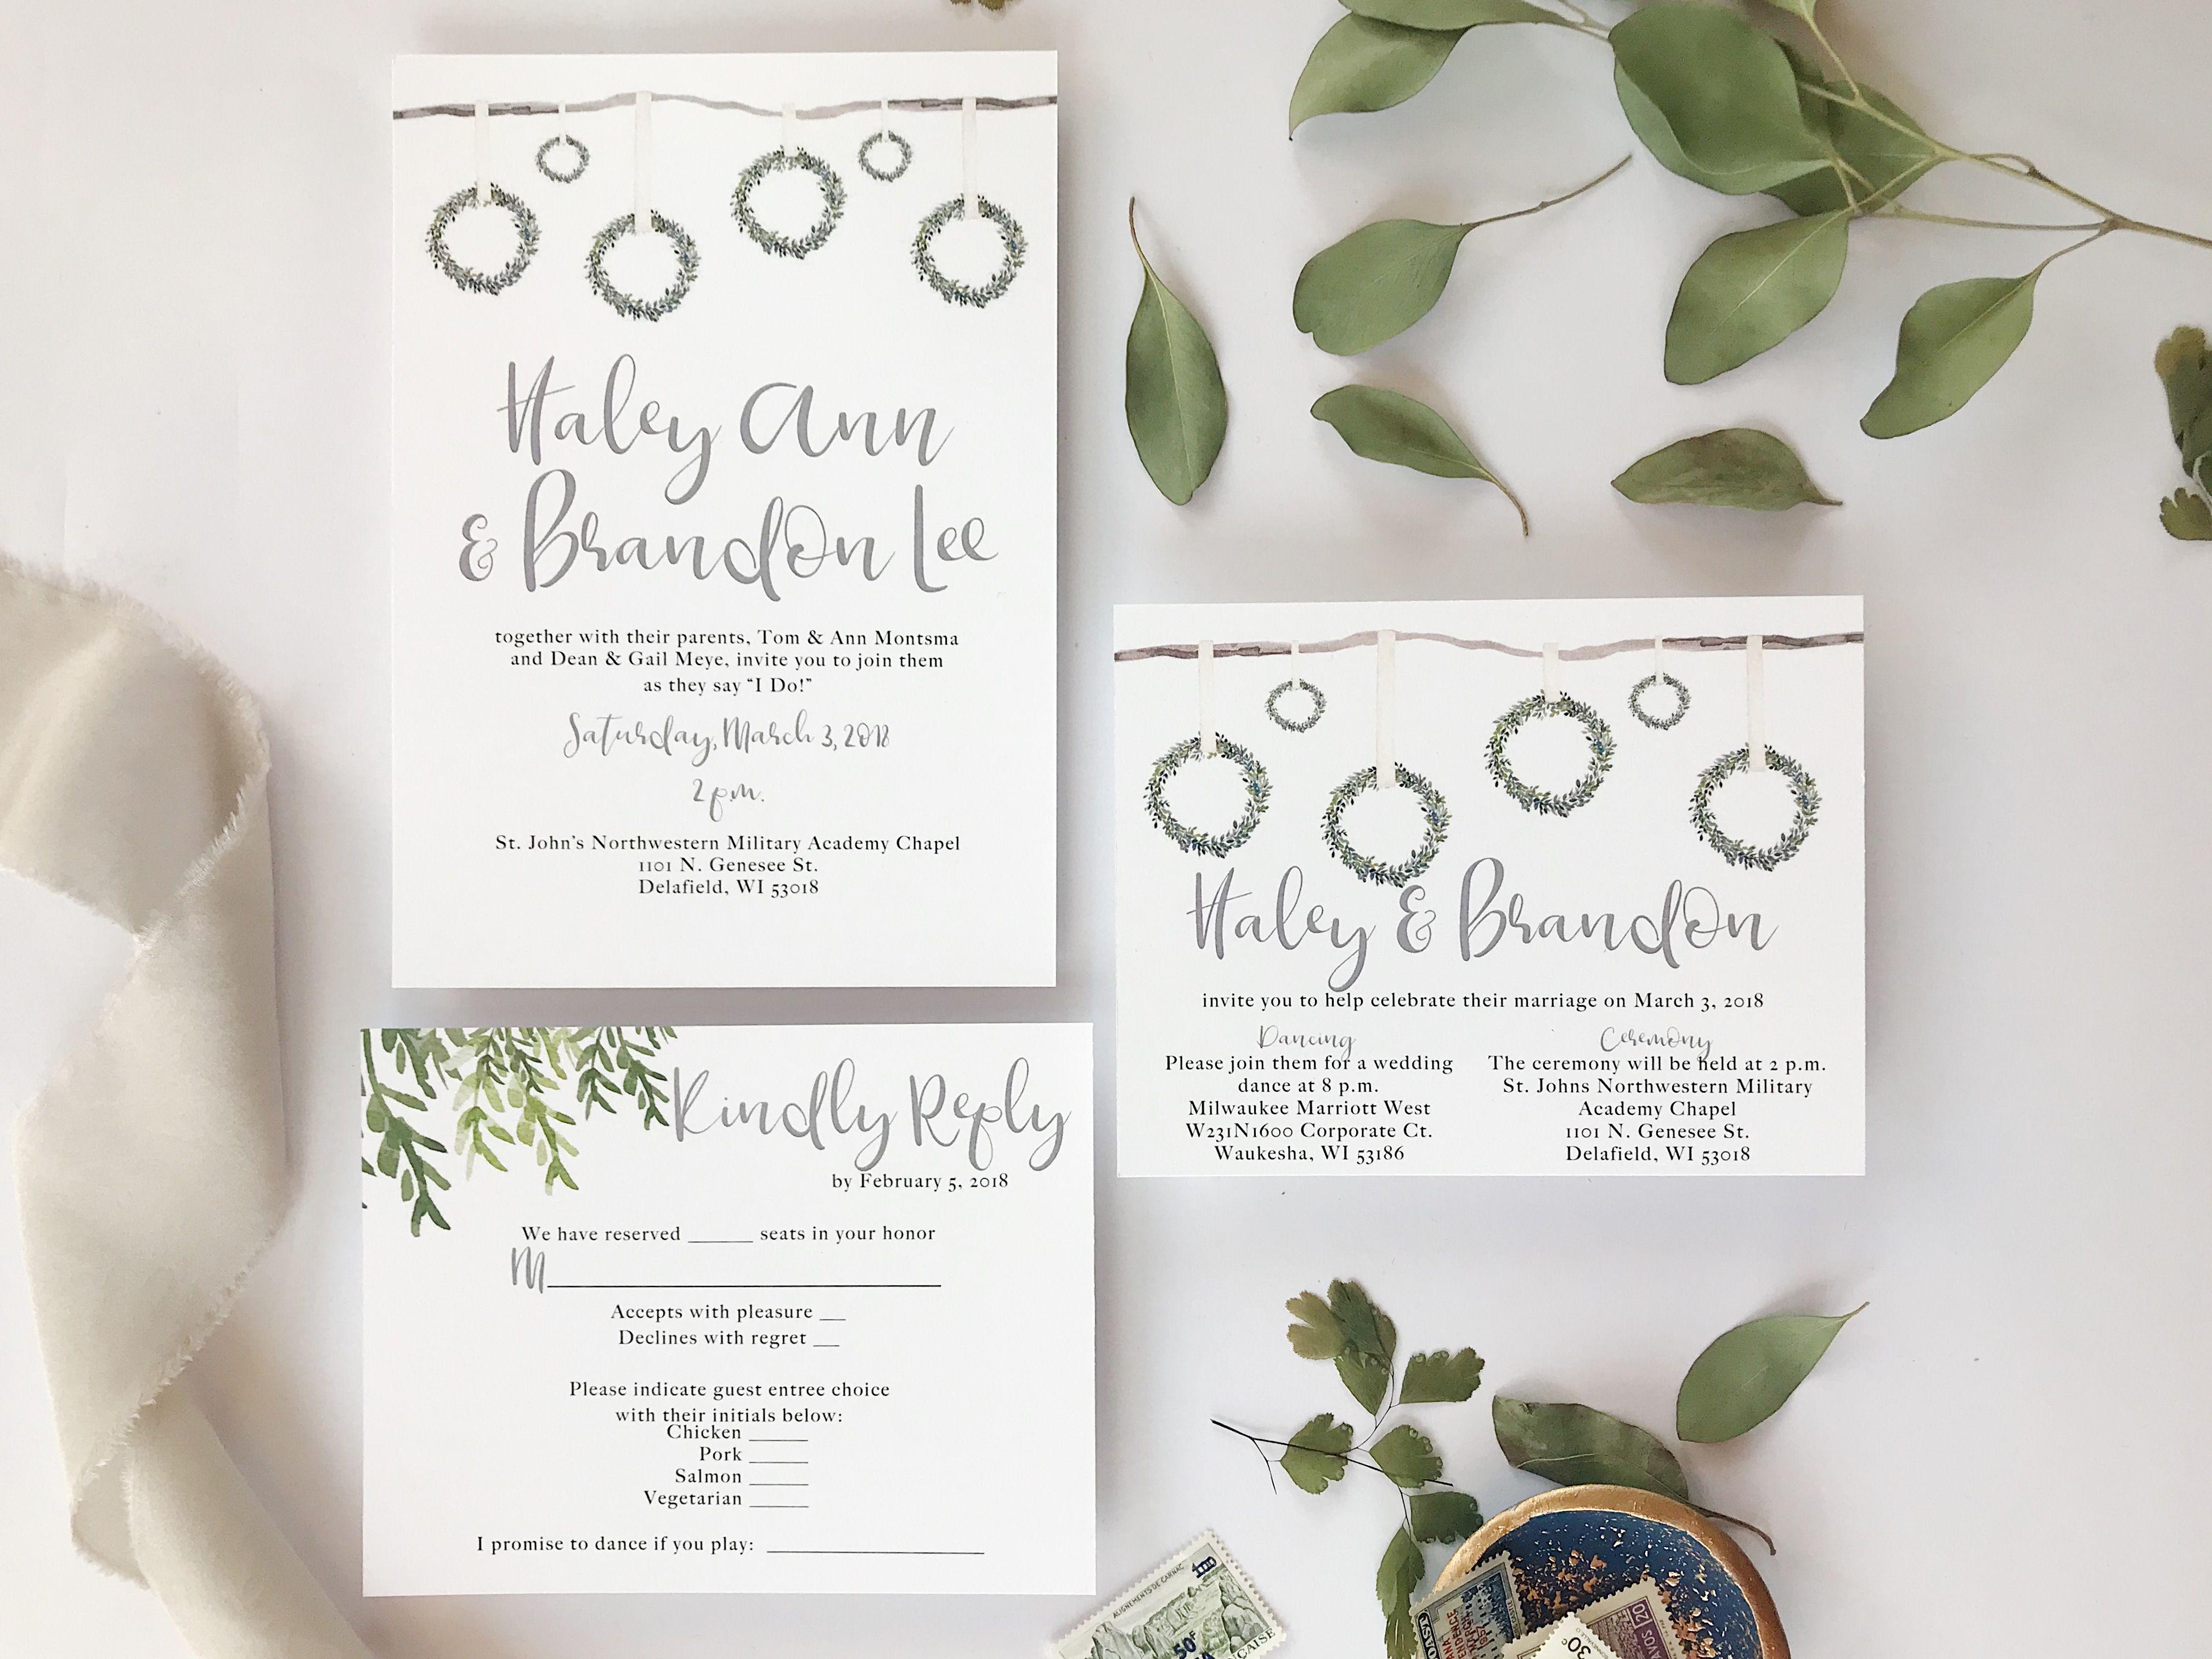 Wedding Invitation Reveal Rustic Wreath By Unica Forma Wreaths